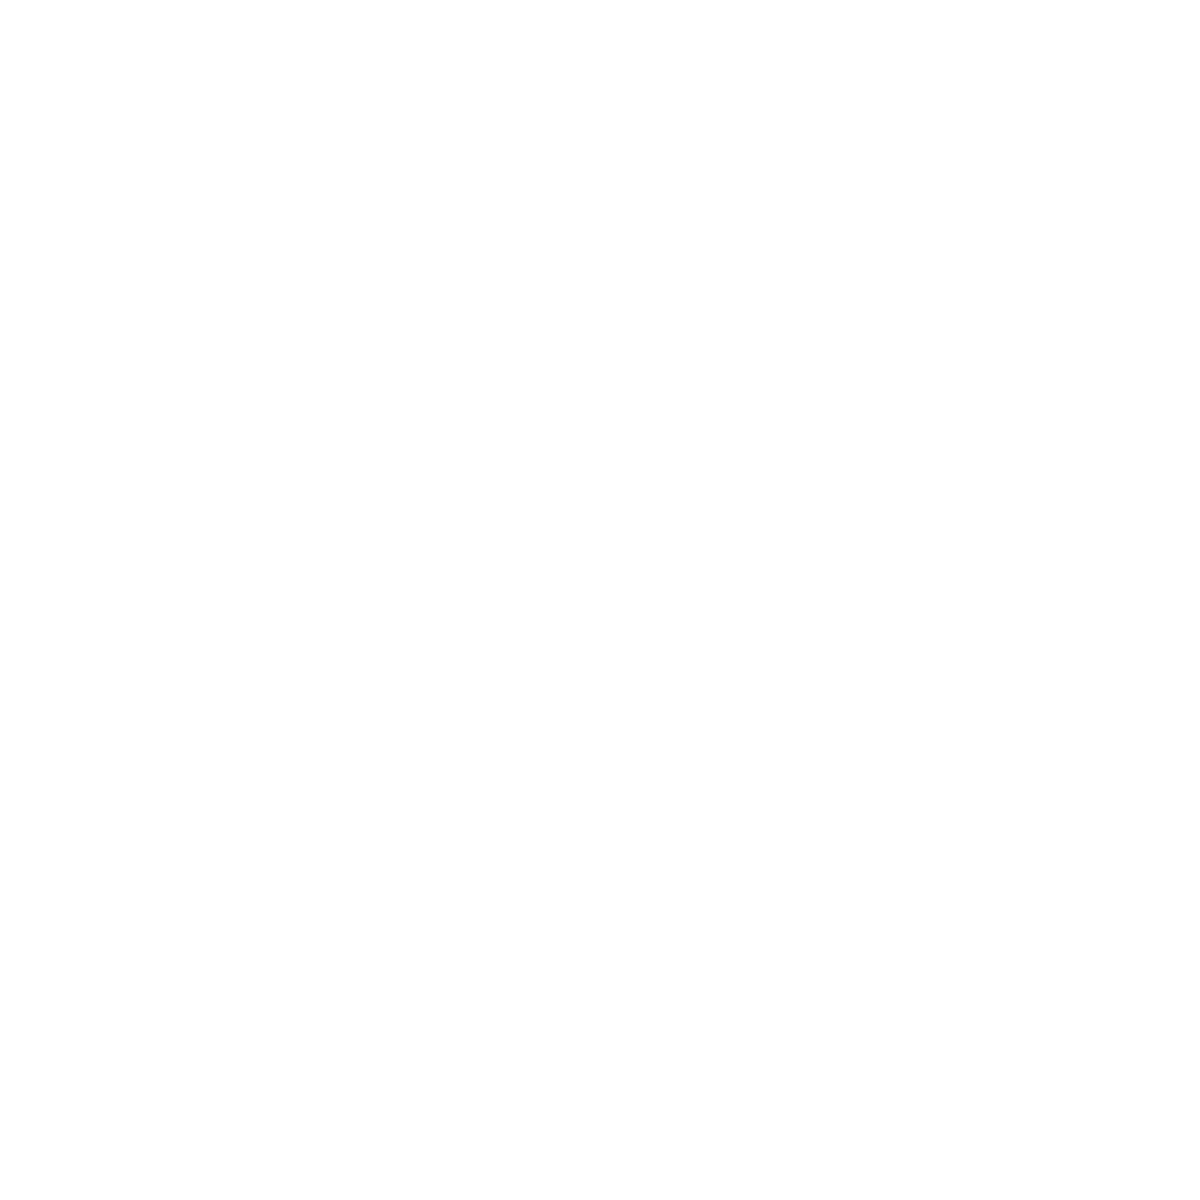 Playground Marking Football Court